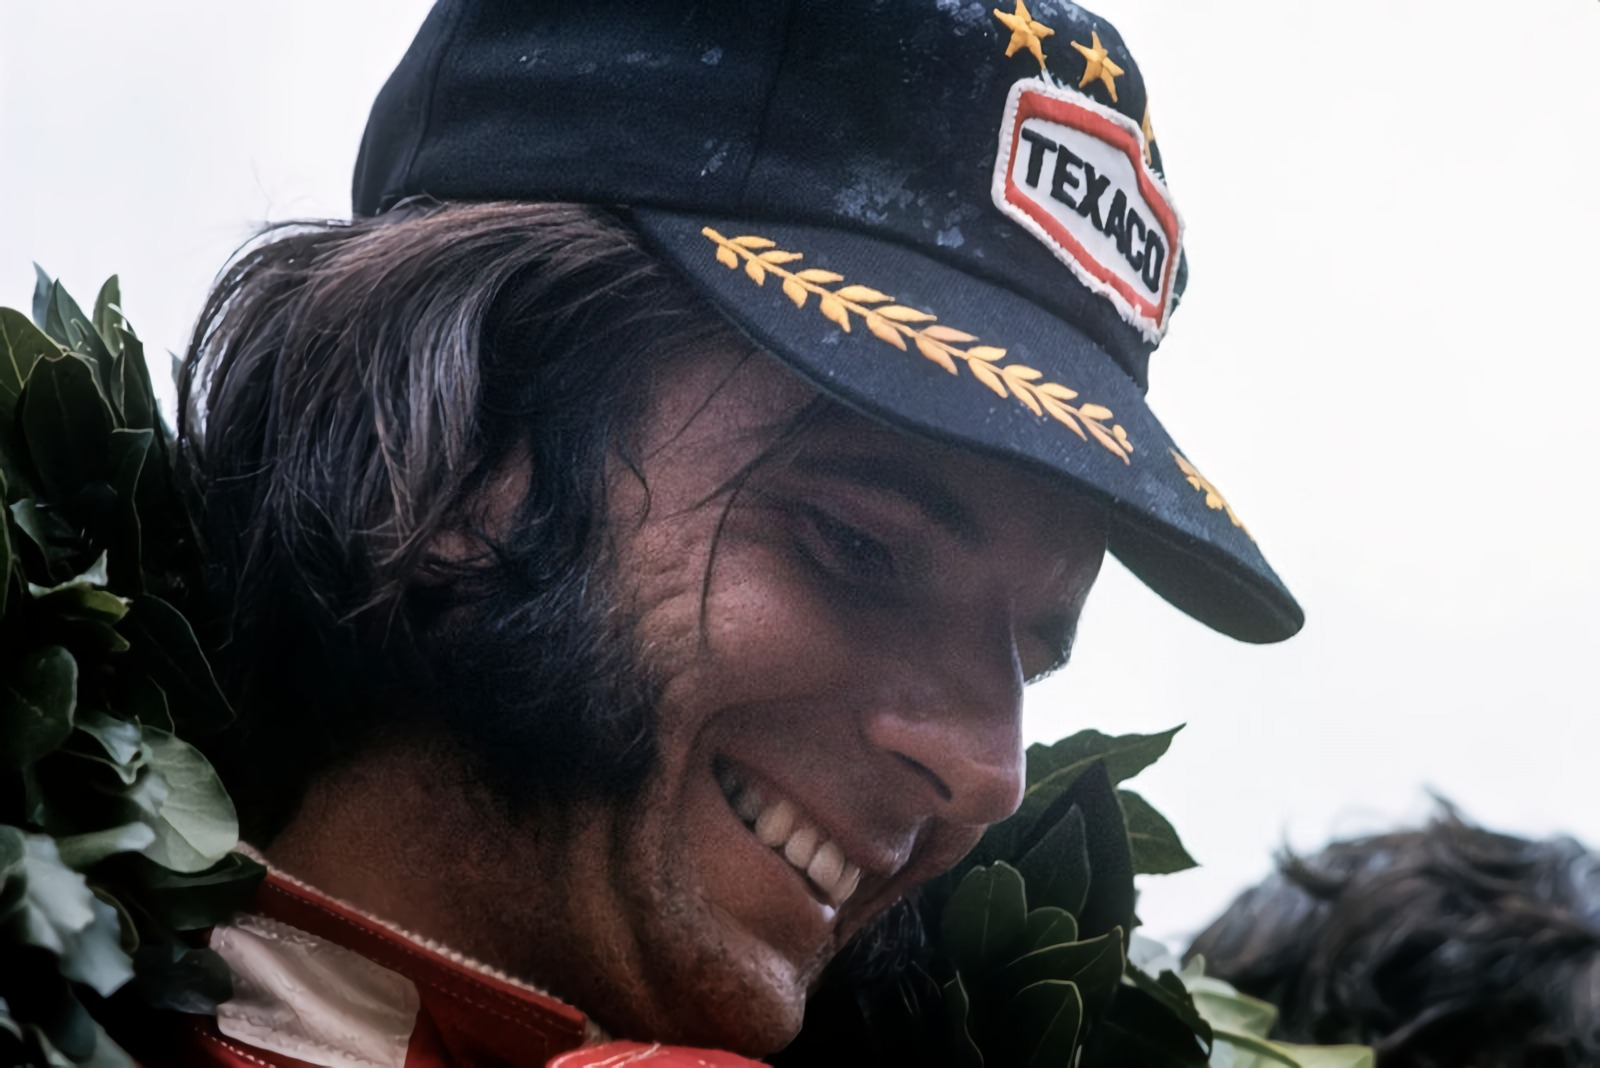 #9 Hall of Fame: Emerson Fittipaldi